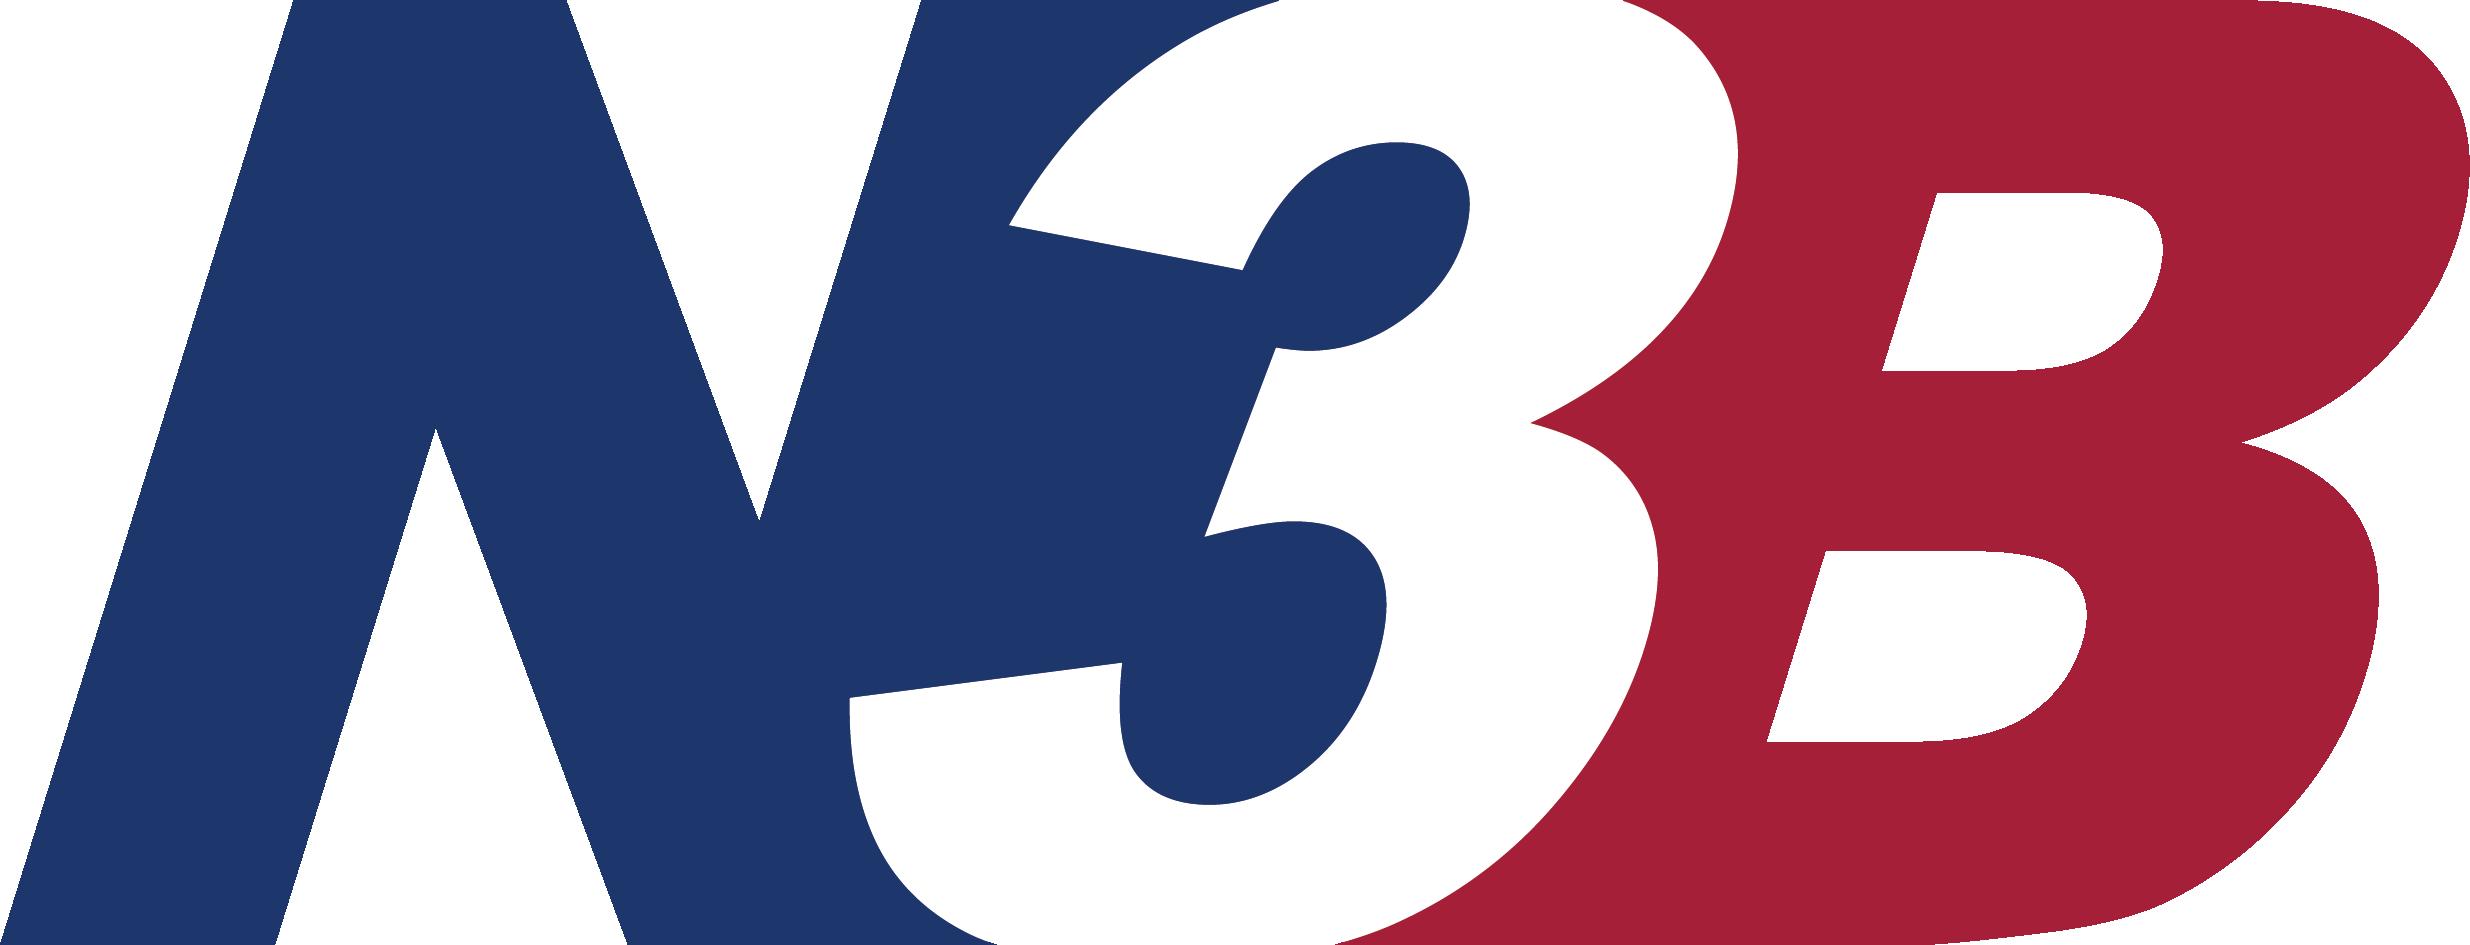 Logo Preview Image